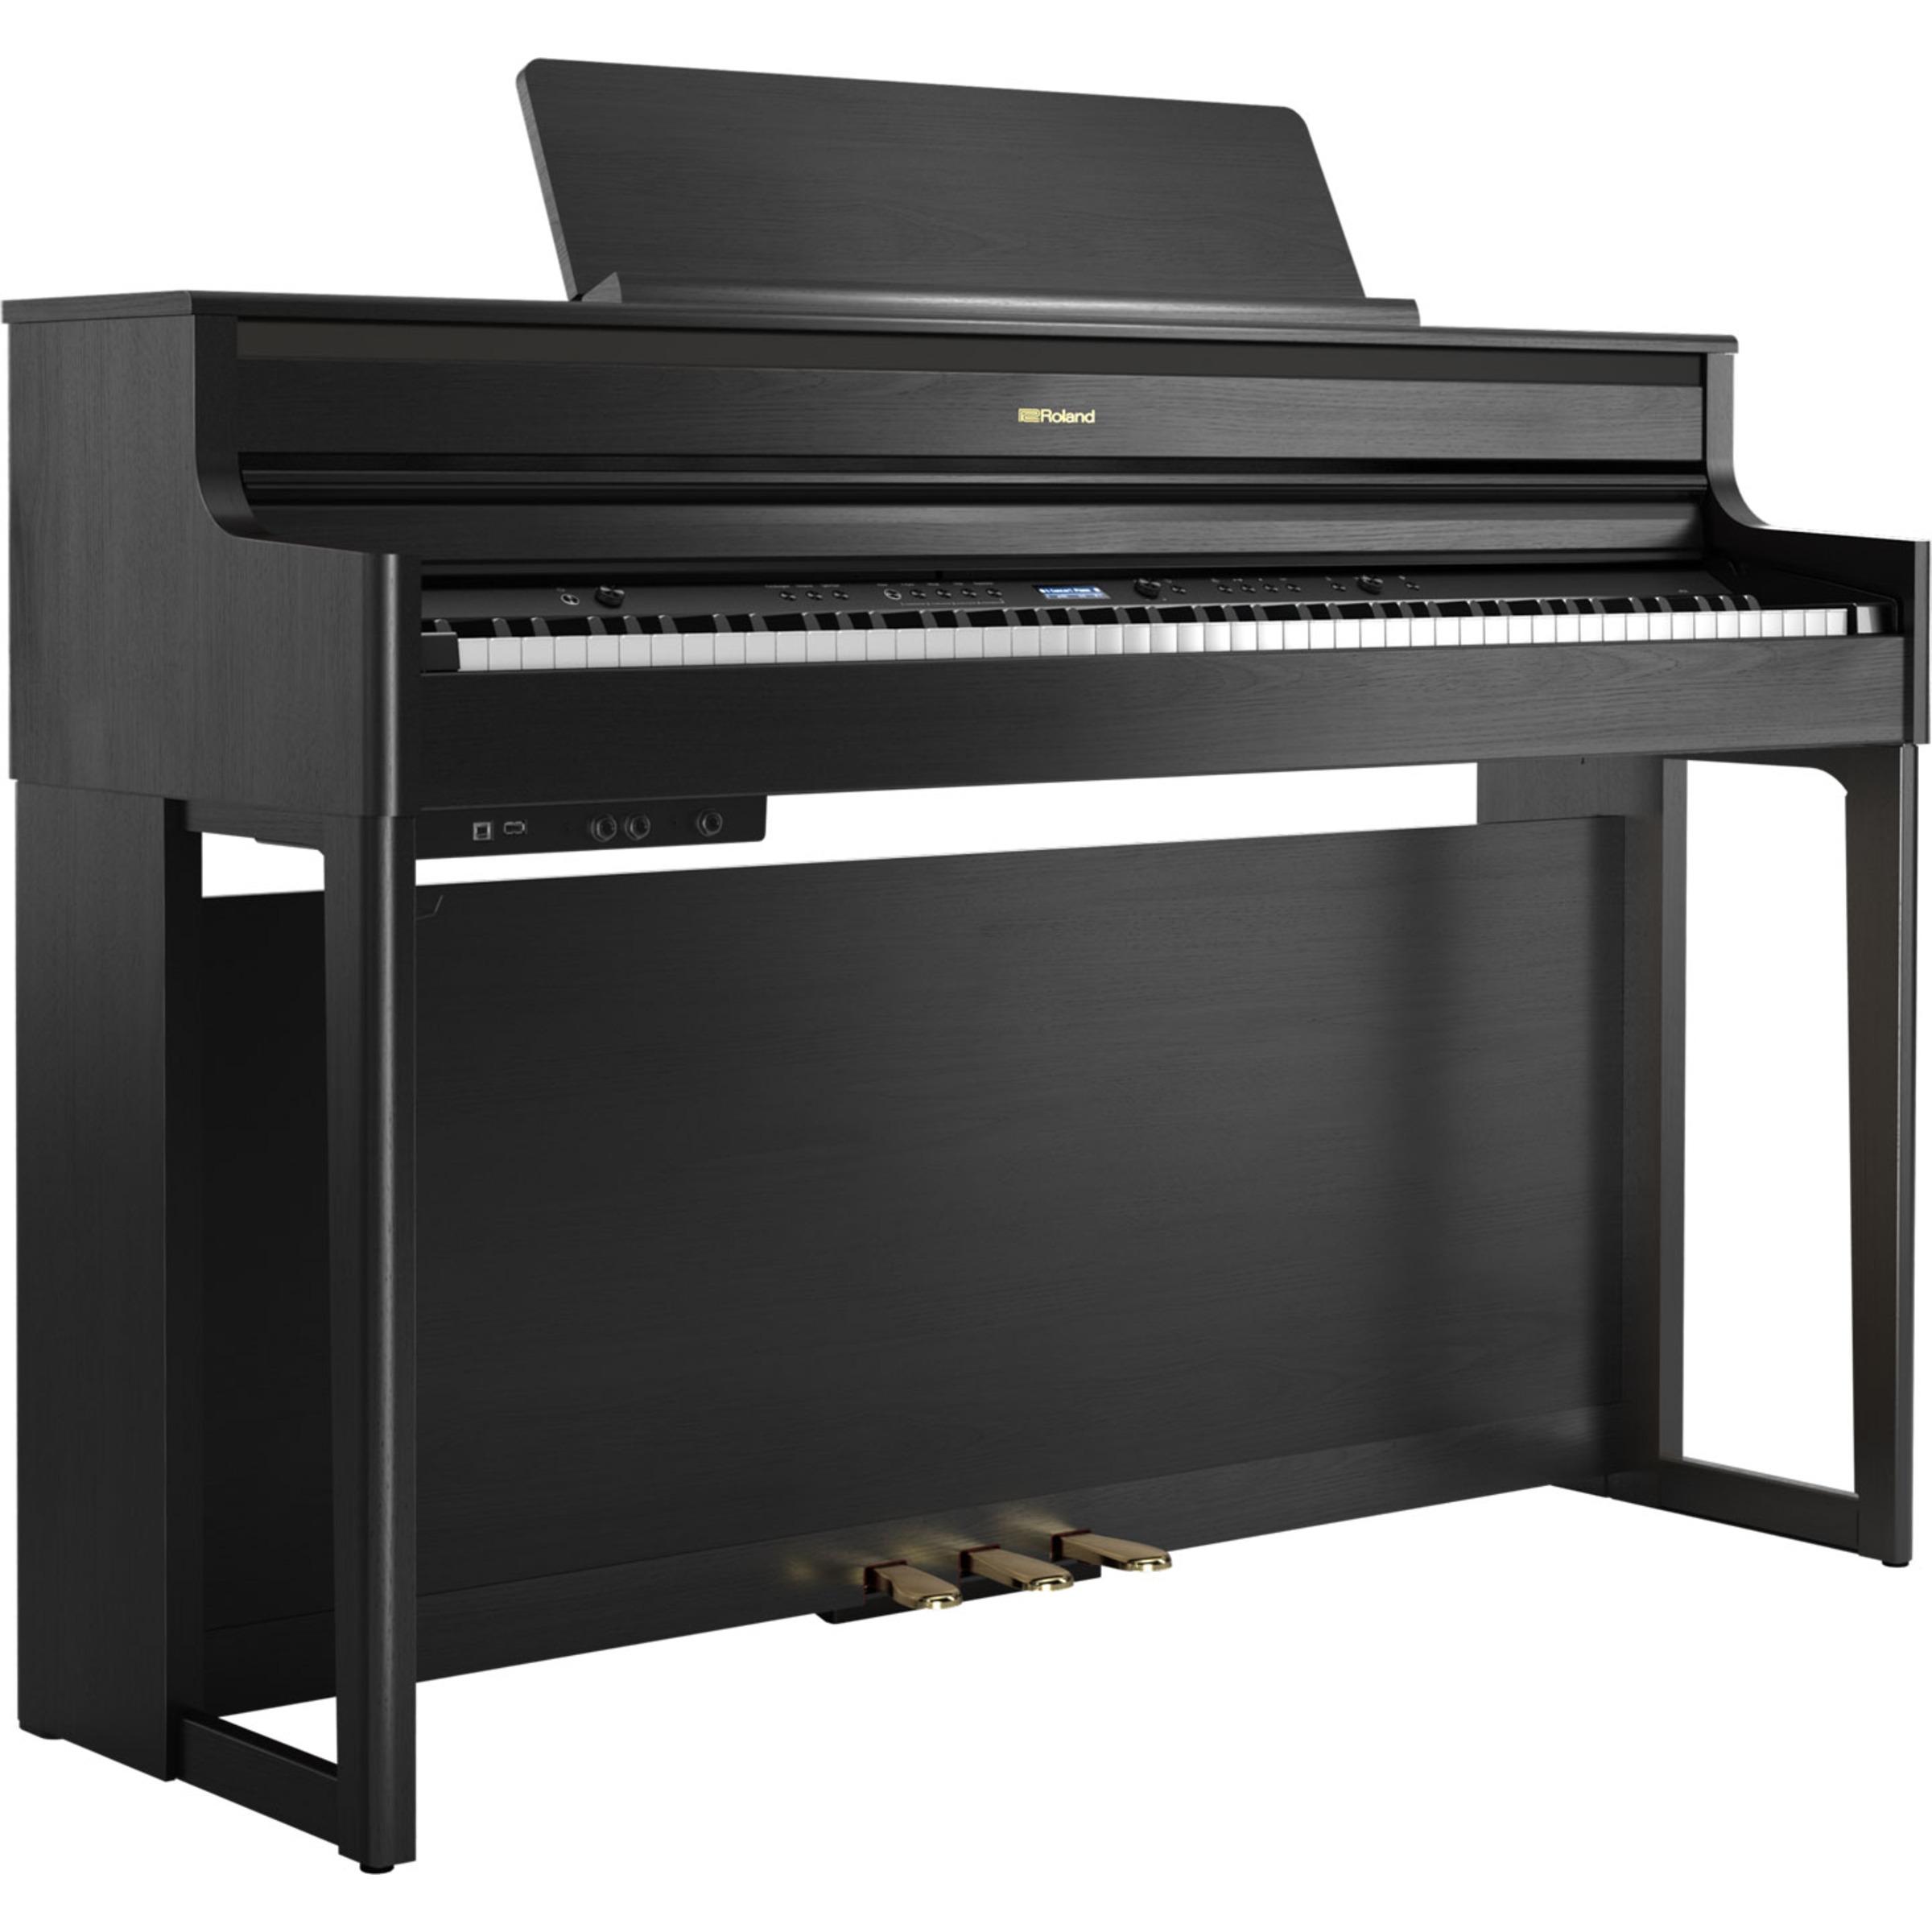 pianos keys roland hp704 digital piano giggear. Black Bedroom Furniture Sets. Home Design Ideas